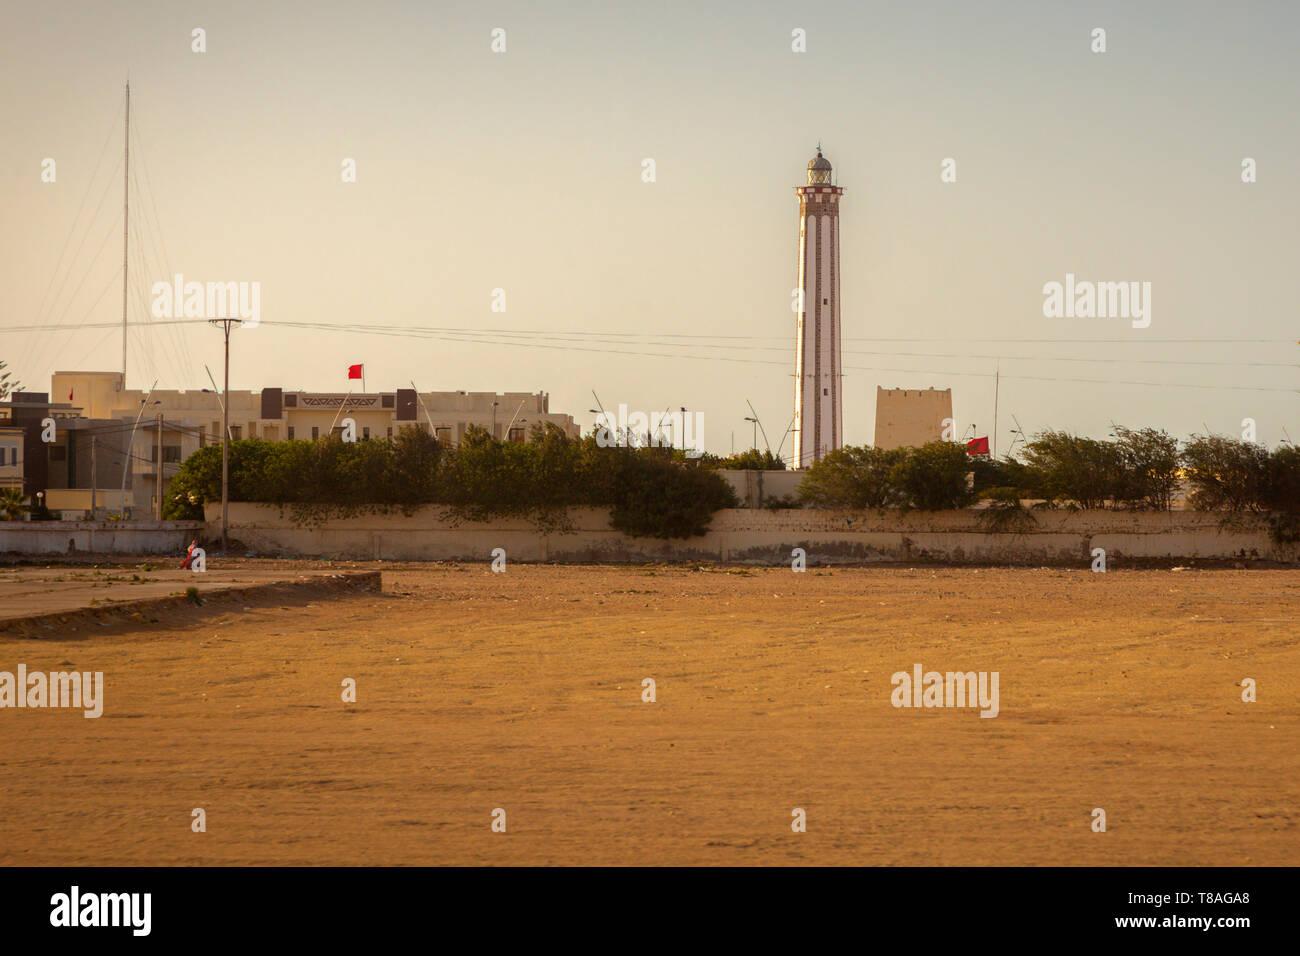 Lighthouse in Boujdour. Boujdour, Western Sahara, Morocco. - Stock Image